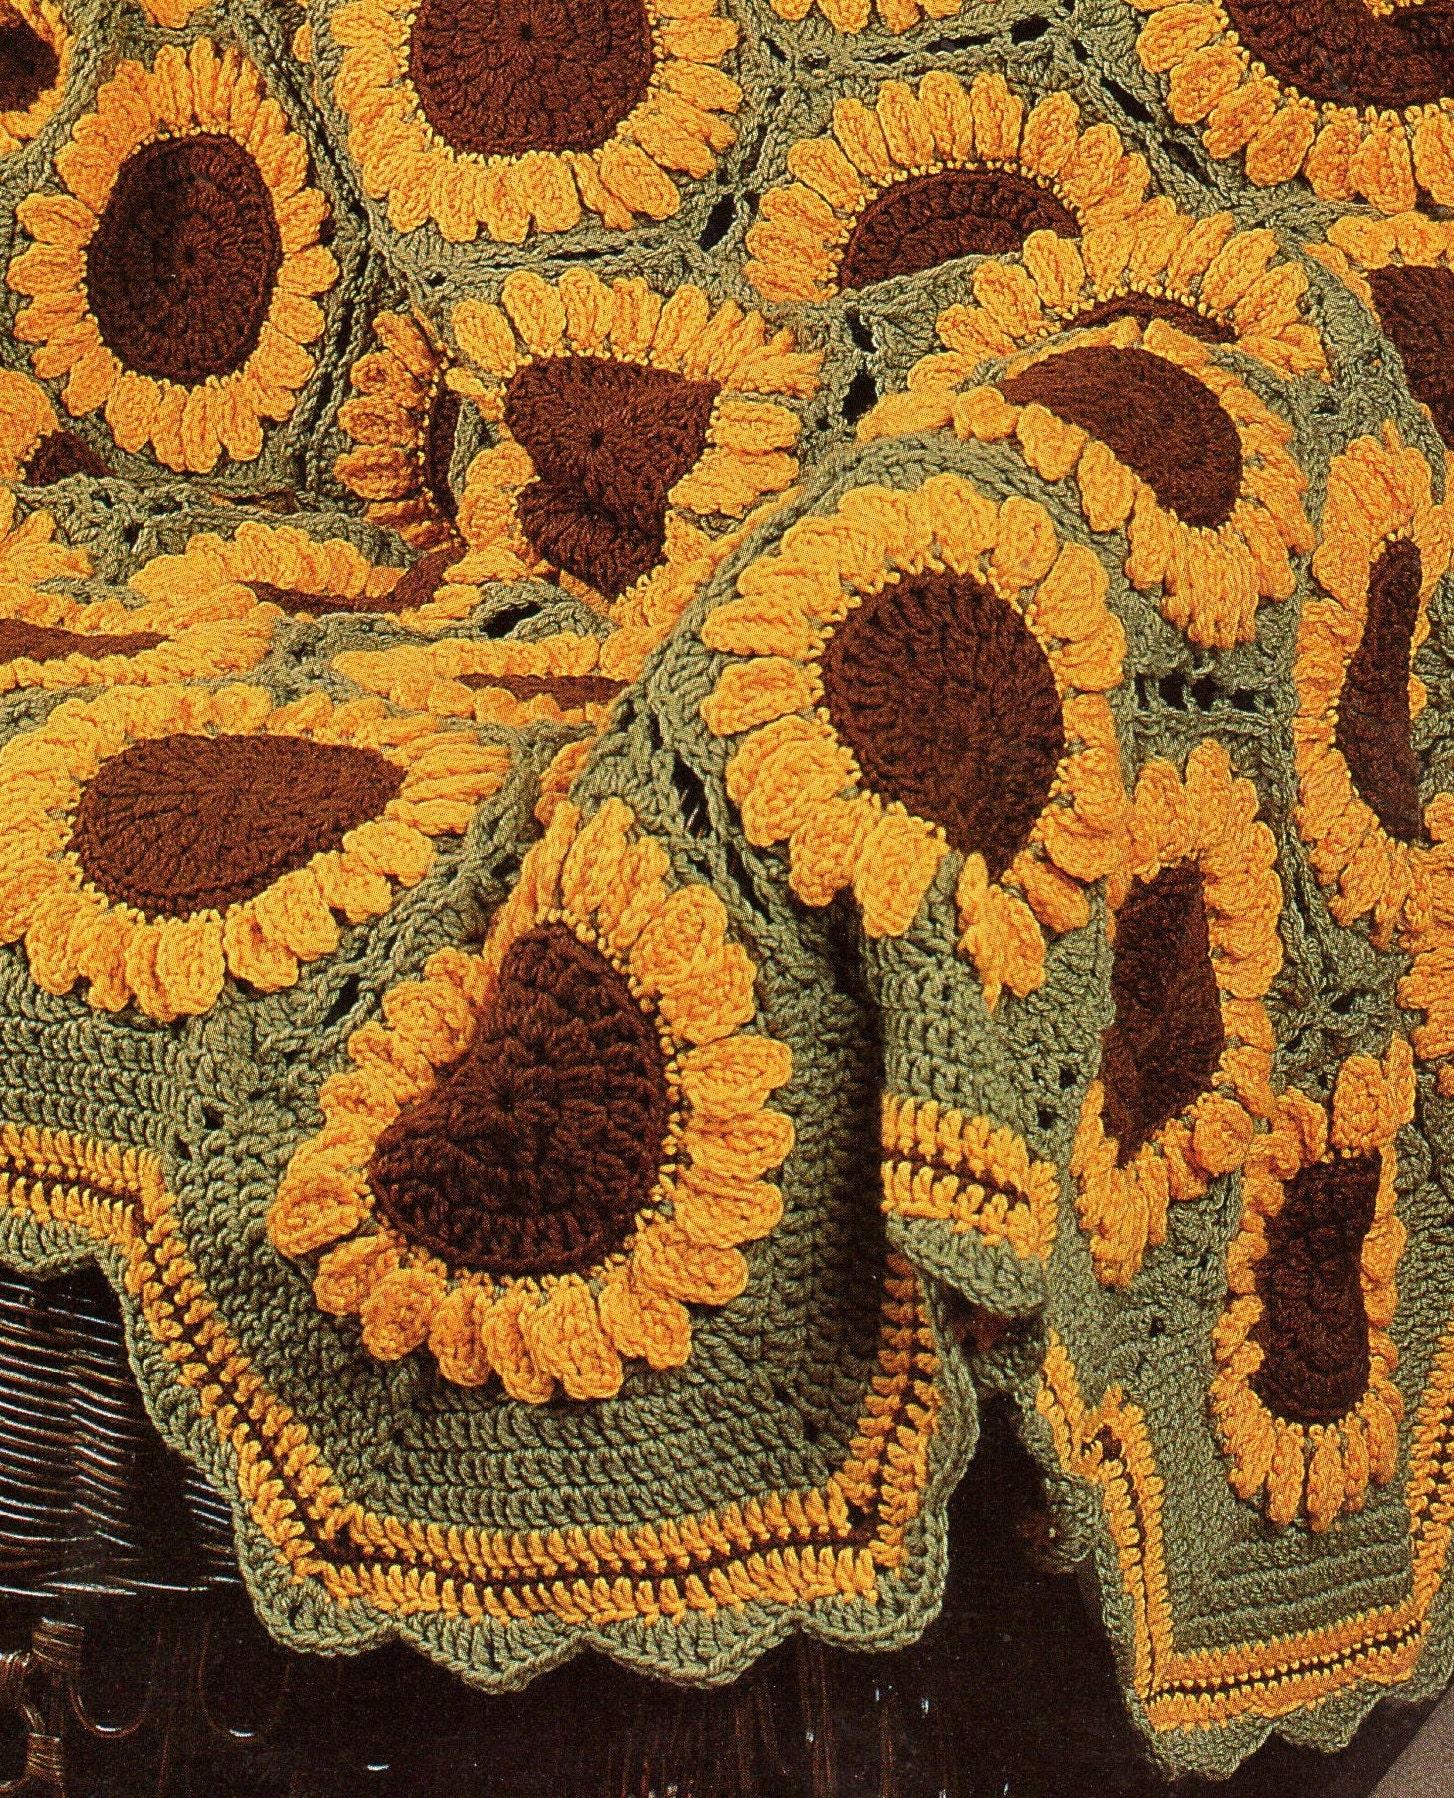 Vintage Crochet Sunflowers Afghan Pattern PDF Instant Digital